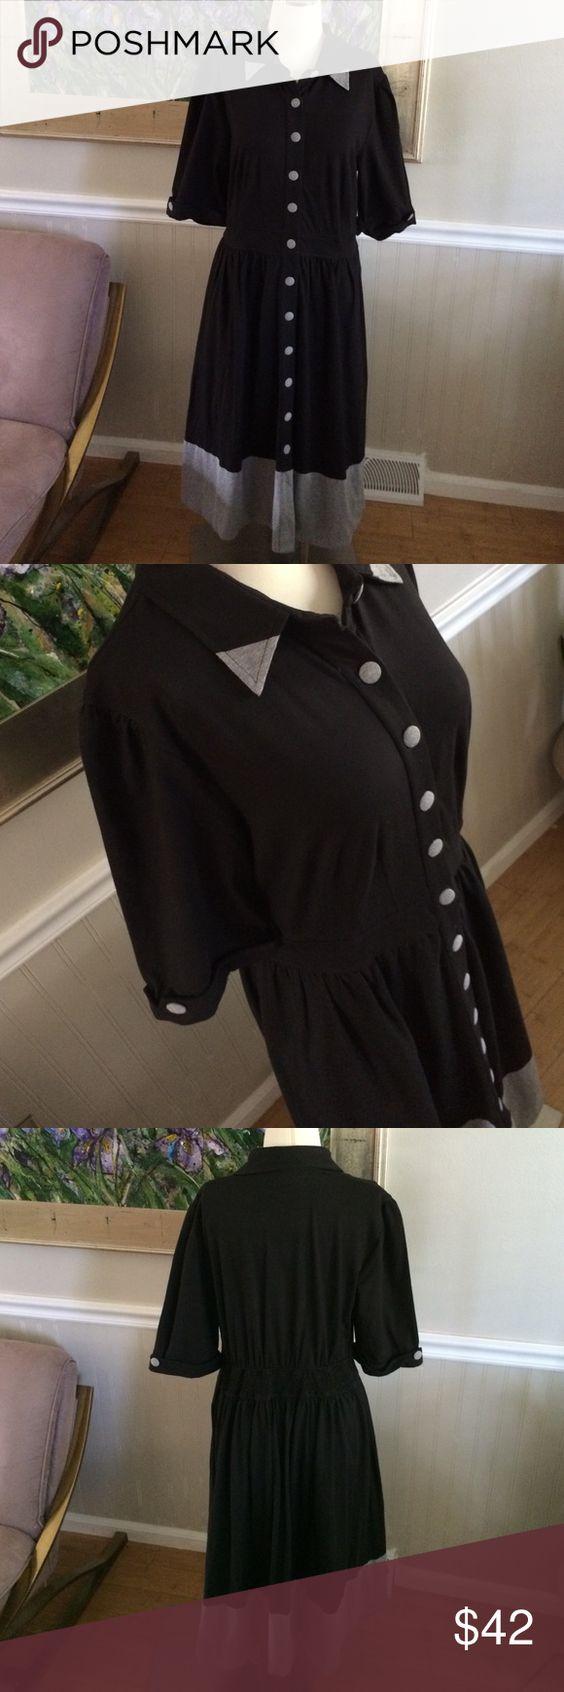 "Eshakti black and gray dress NWOT!  Stretchy waist, retro style.  Measures 43"" long and 19"" armpit to armpit.  Made in India eshakti Dresses Midi"